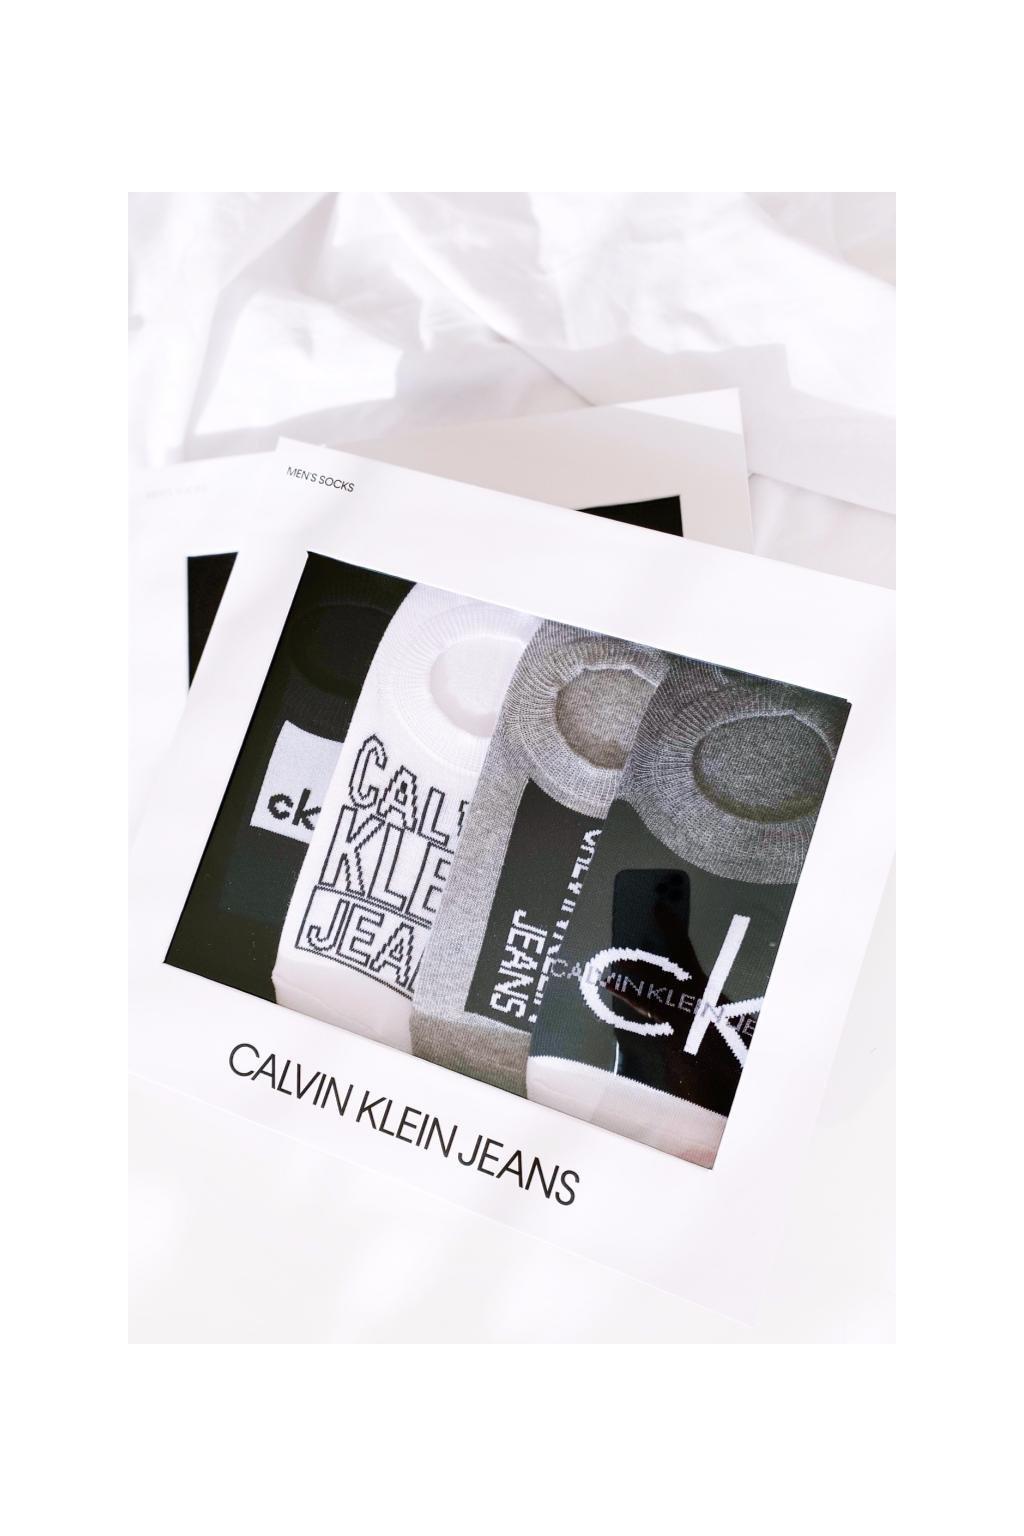 Dárkové balení Calvin Klein 4 páry pánských ponožek - černá, bílá, šedá